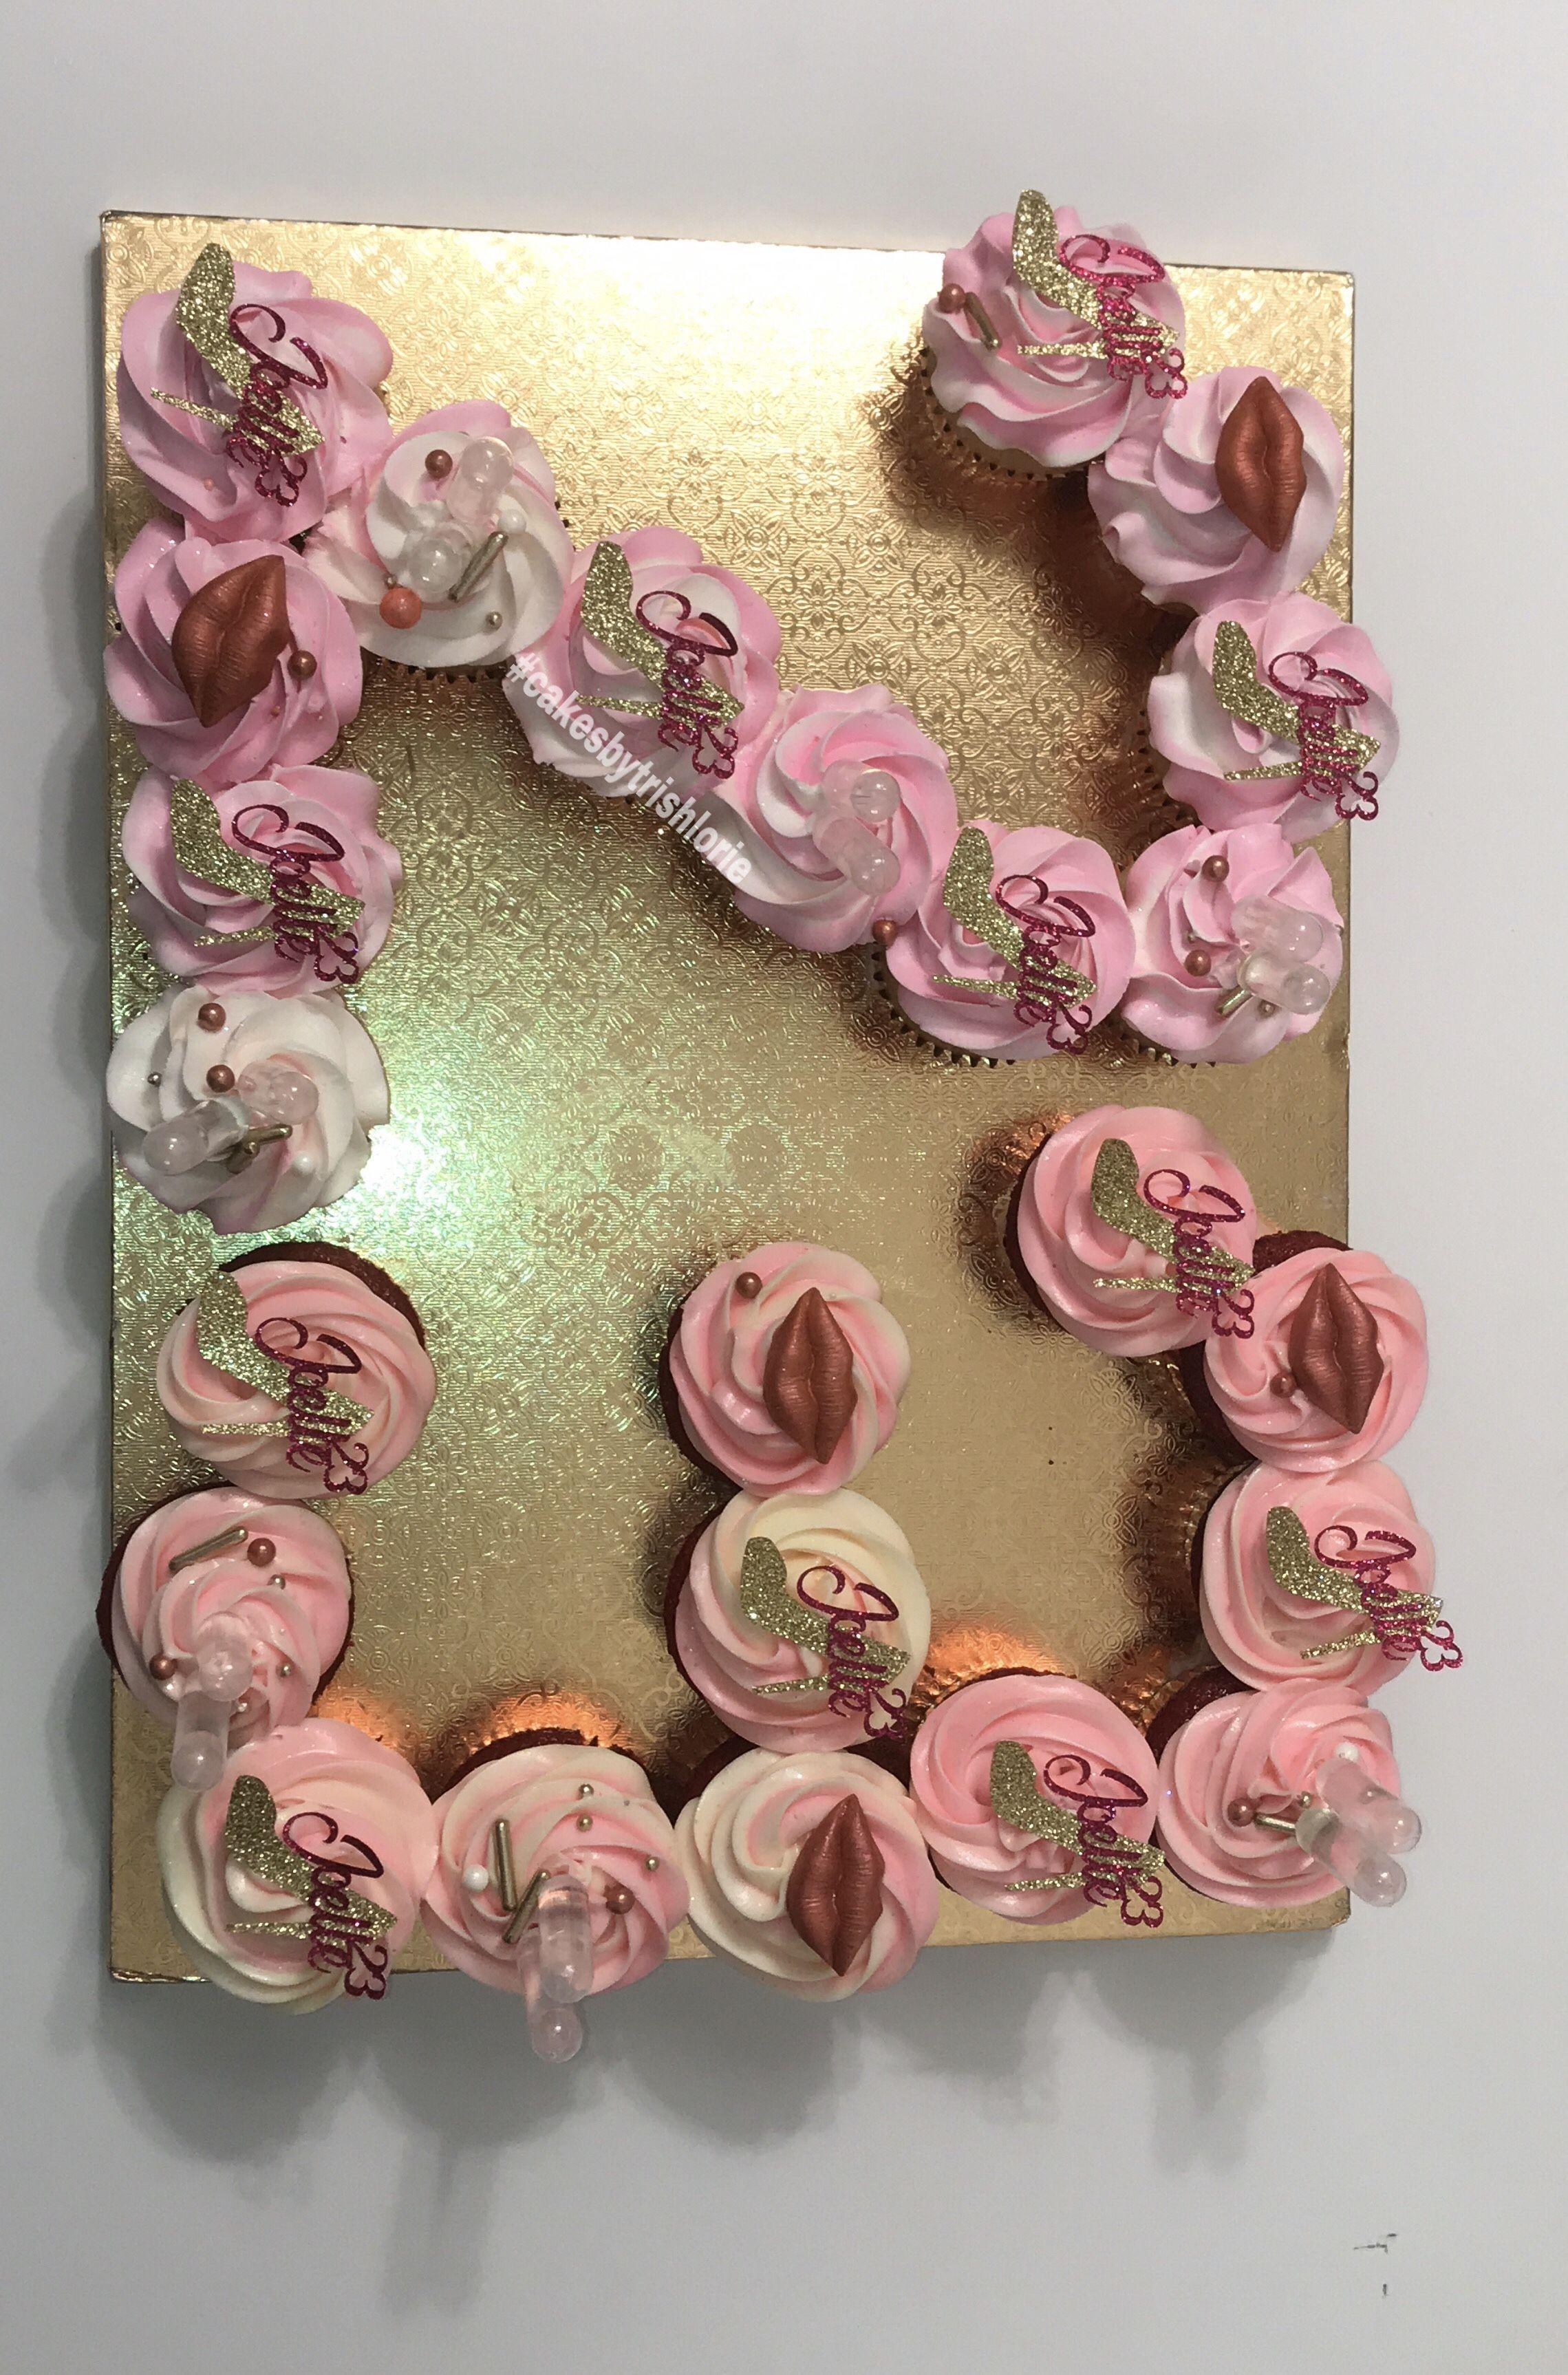 Number Cupcakes 23 Cupcakes 7up Cake Recipe 23rd Birthday